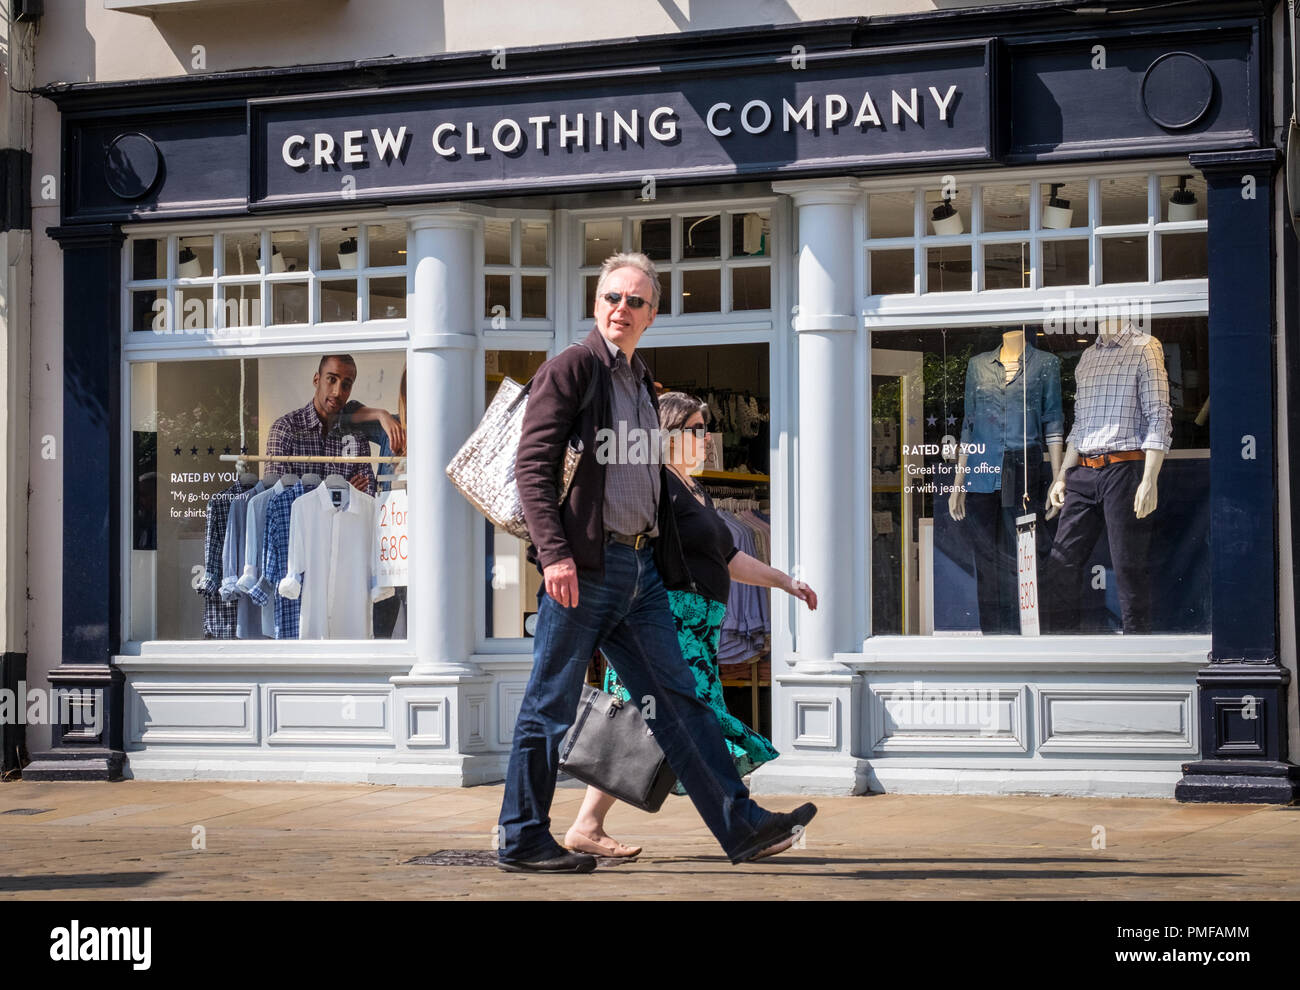 Tripulación Clothing Company store en Winchester, Hampshire, Reino Unido Imagen De Stock